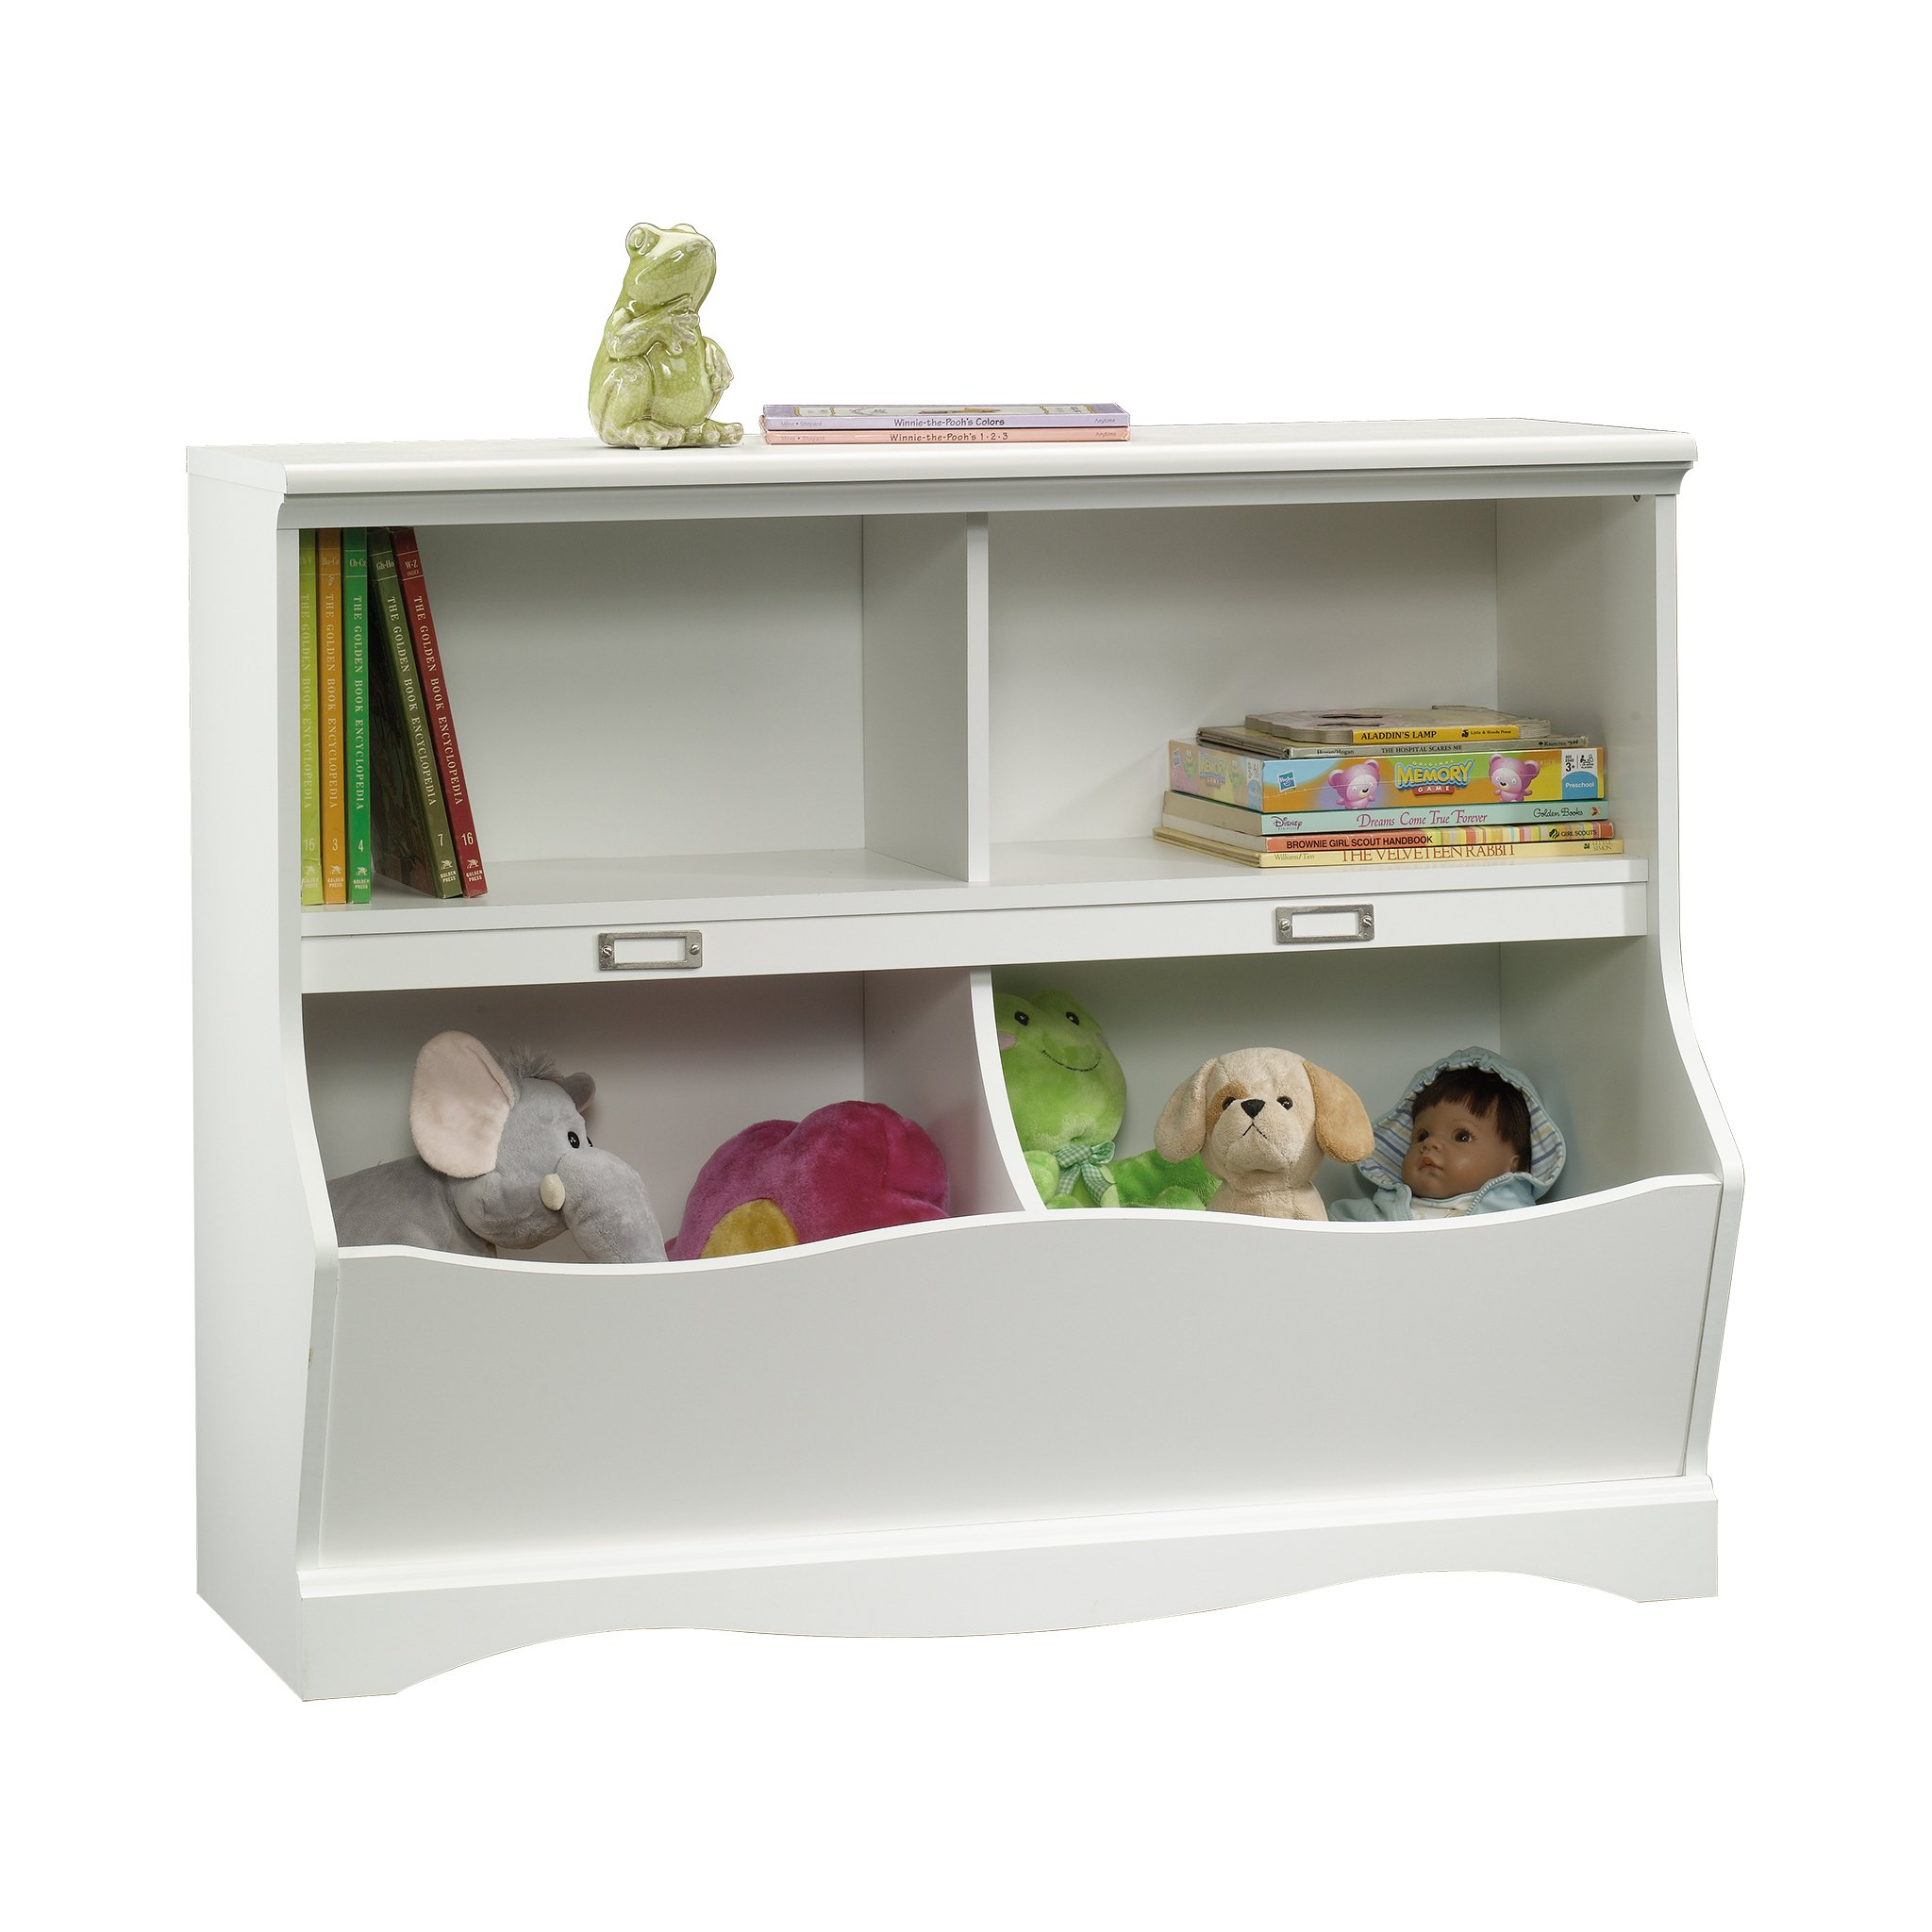 Sauder 414436 Pogo Bookcase/footboard, L: 41.10'' x W: 14.49'' x H: 32.84'', Soft White